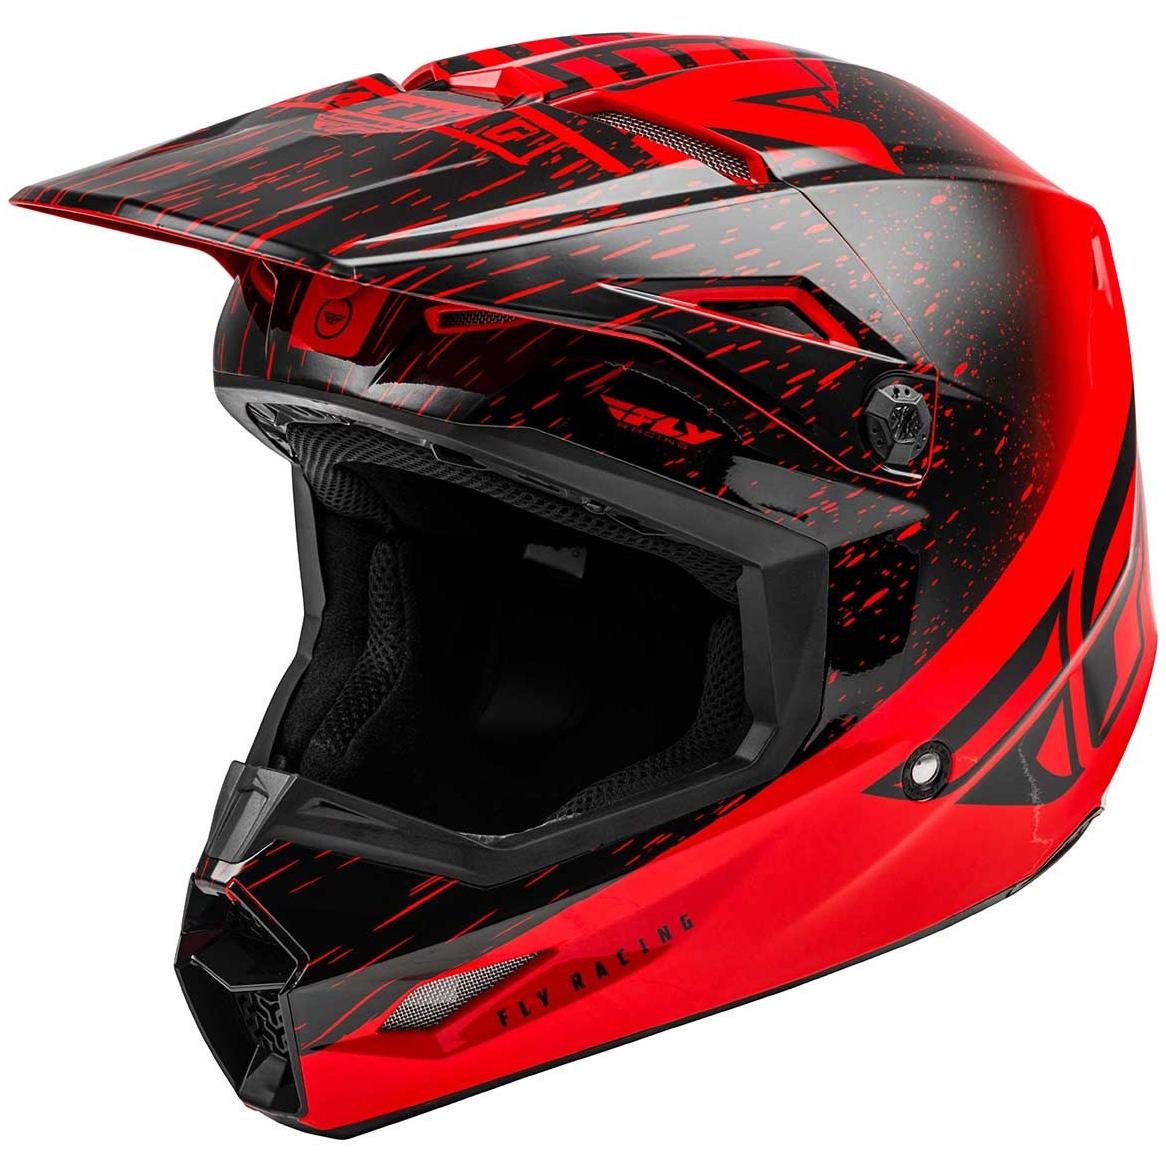 Fly Racing - 2020 Kinetic K120 шлем, красно-черный